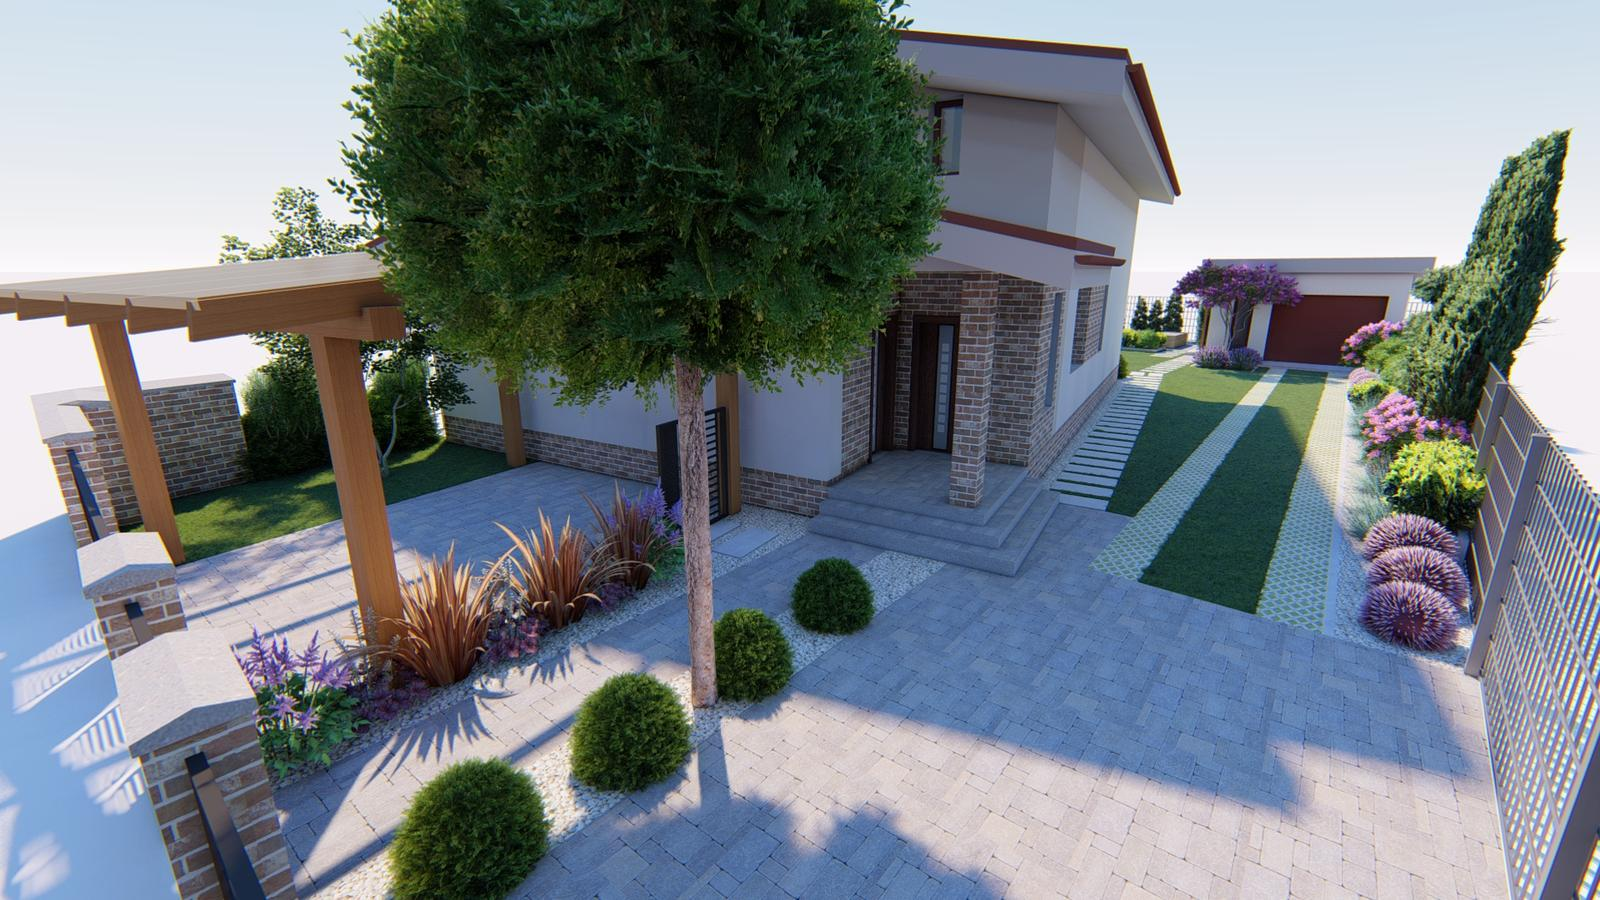 Návrh záhrady rodinného domu. - Obrázok č. 3